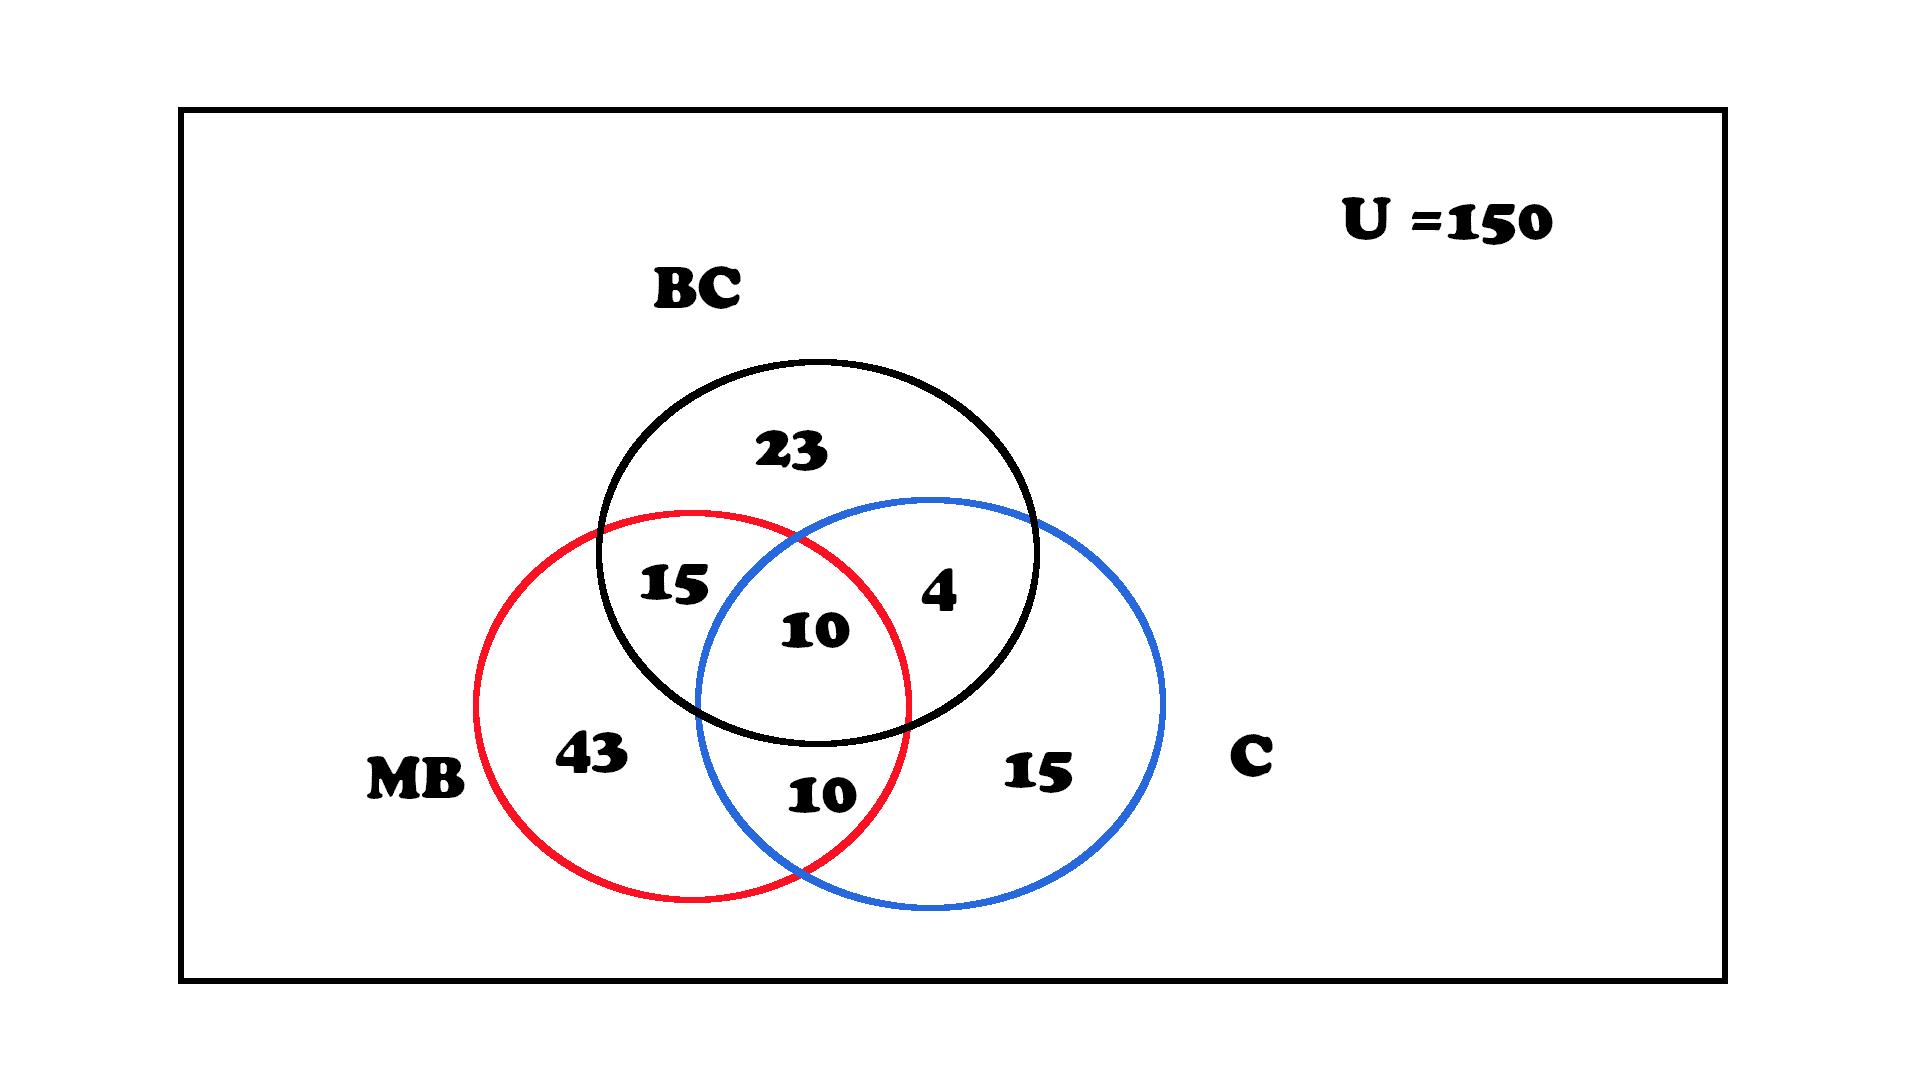 Logical data venn diagram step by step